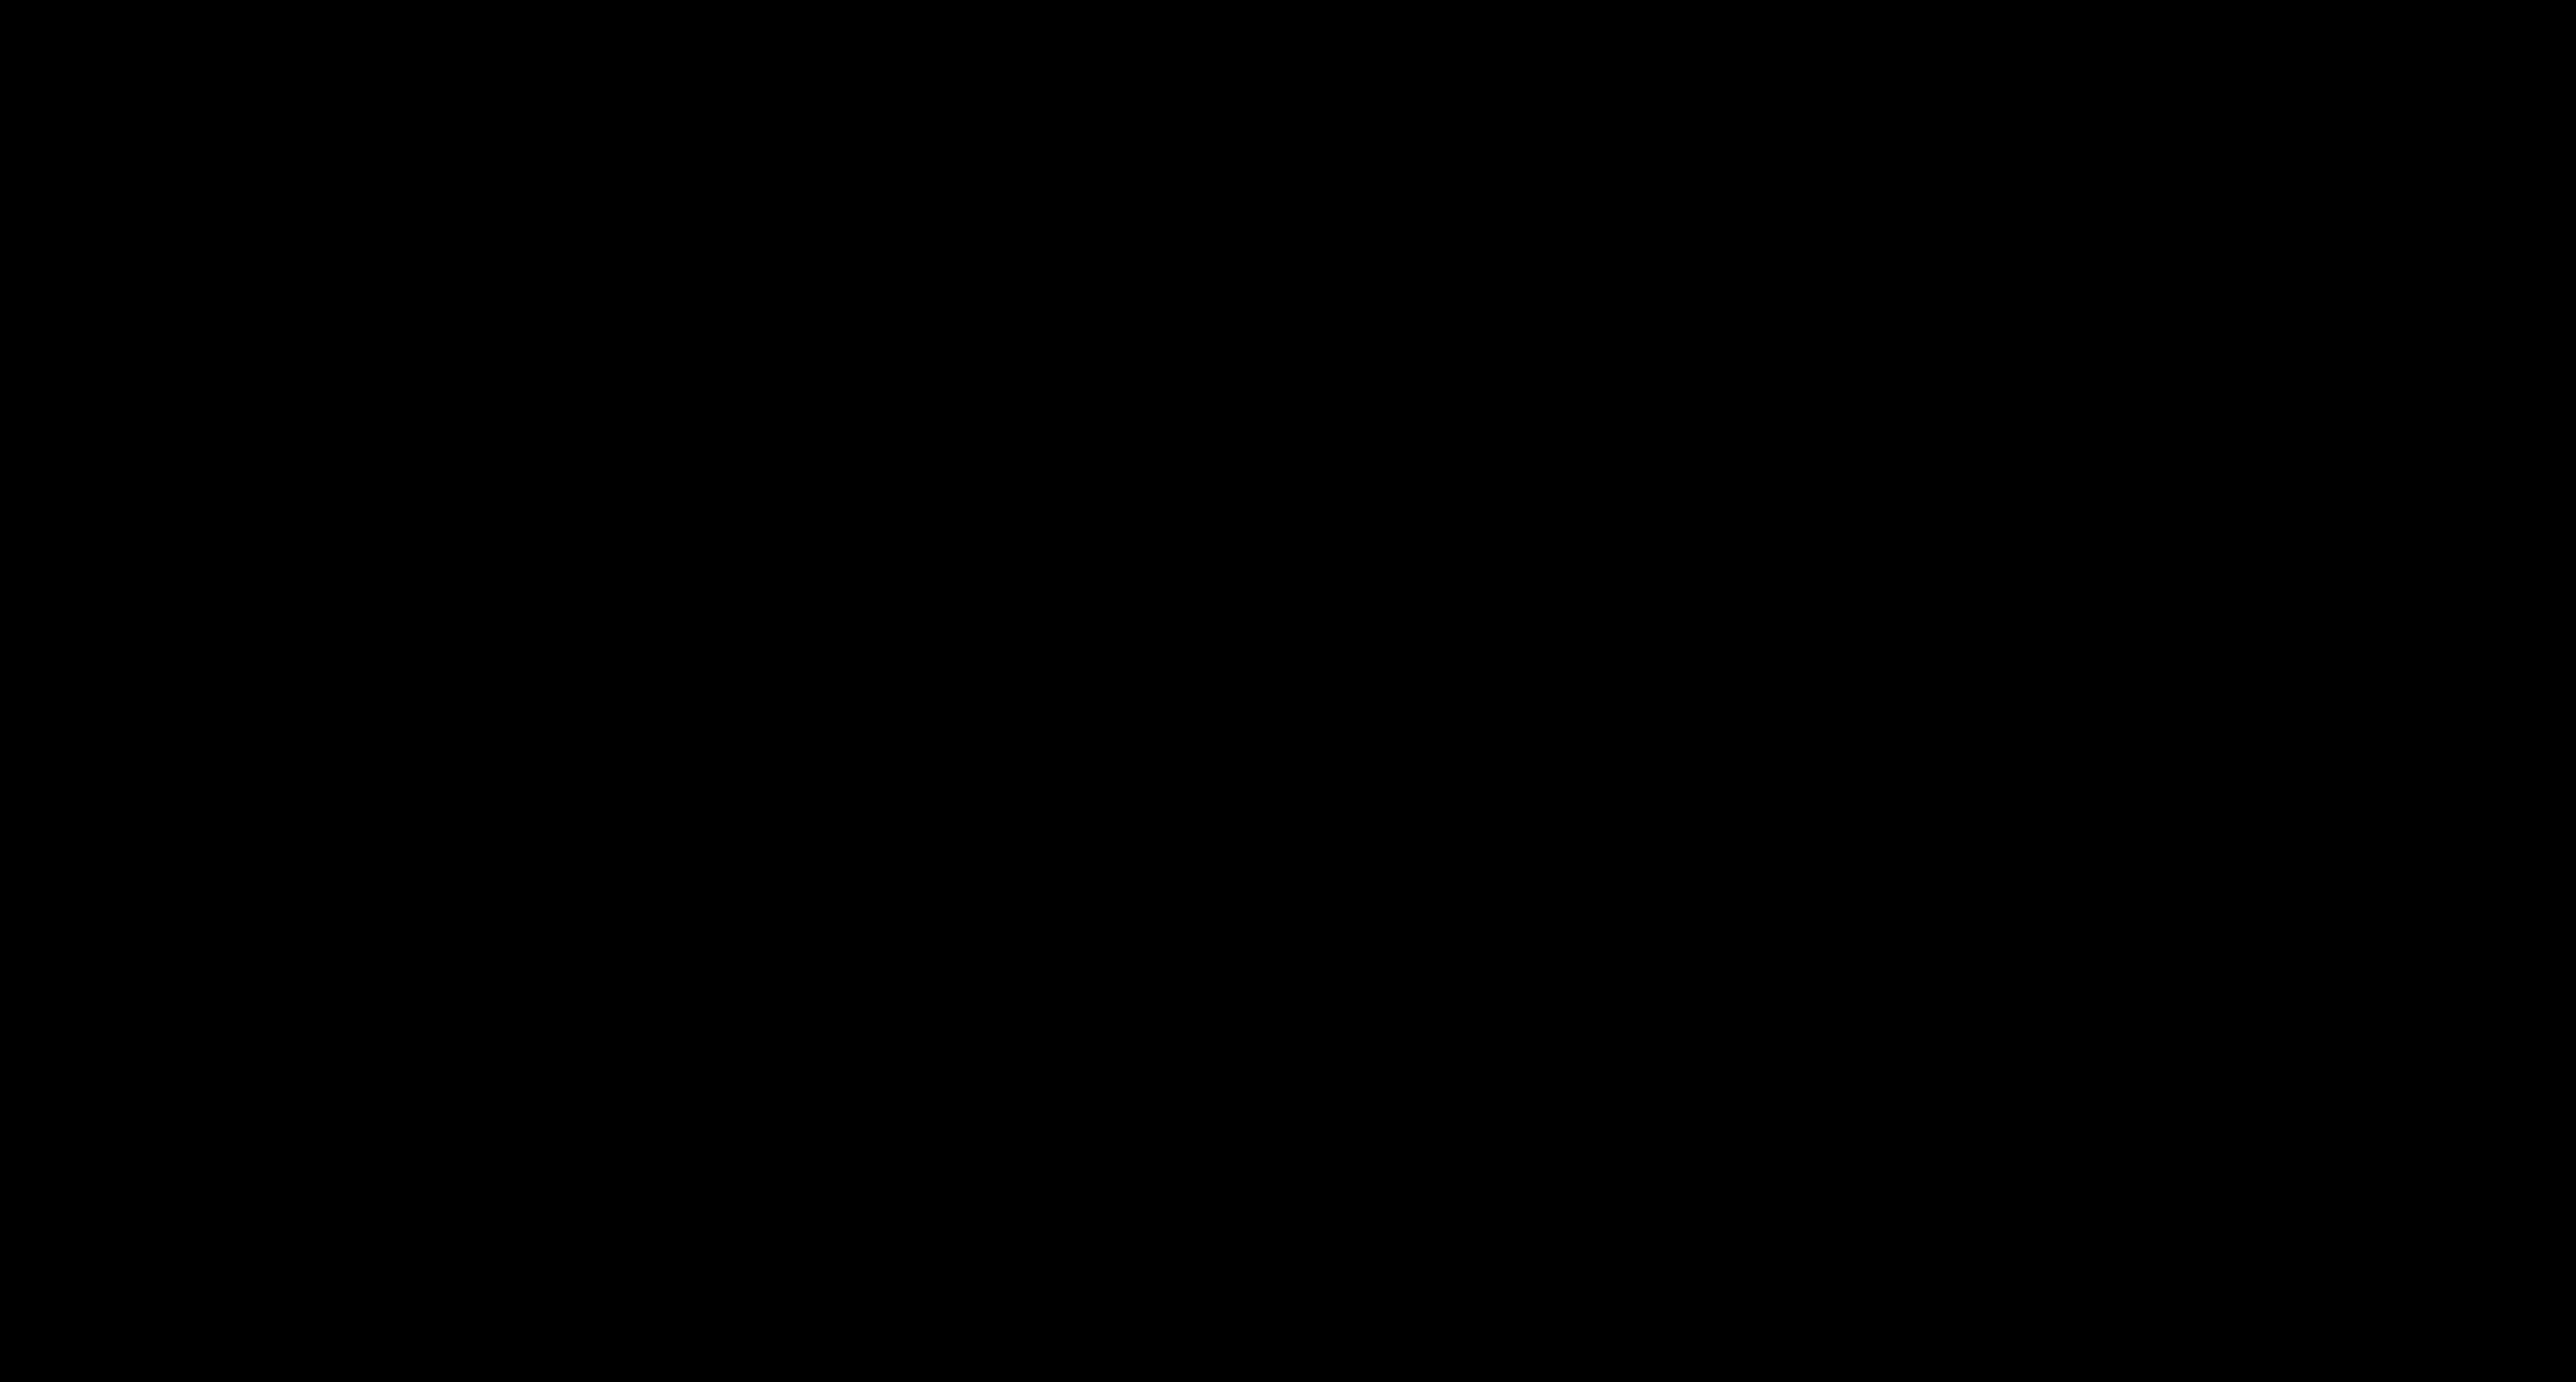 rebelmeat_logo_NEU April 2021